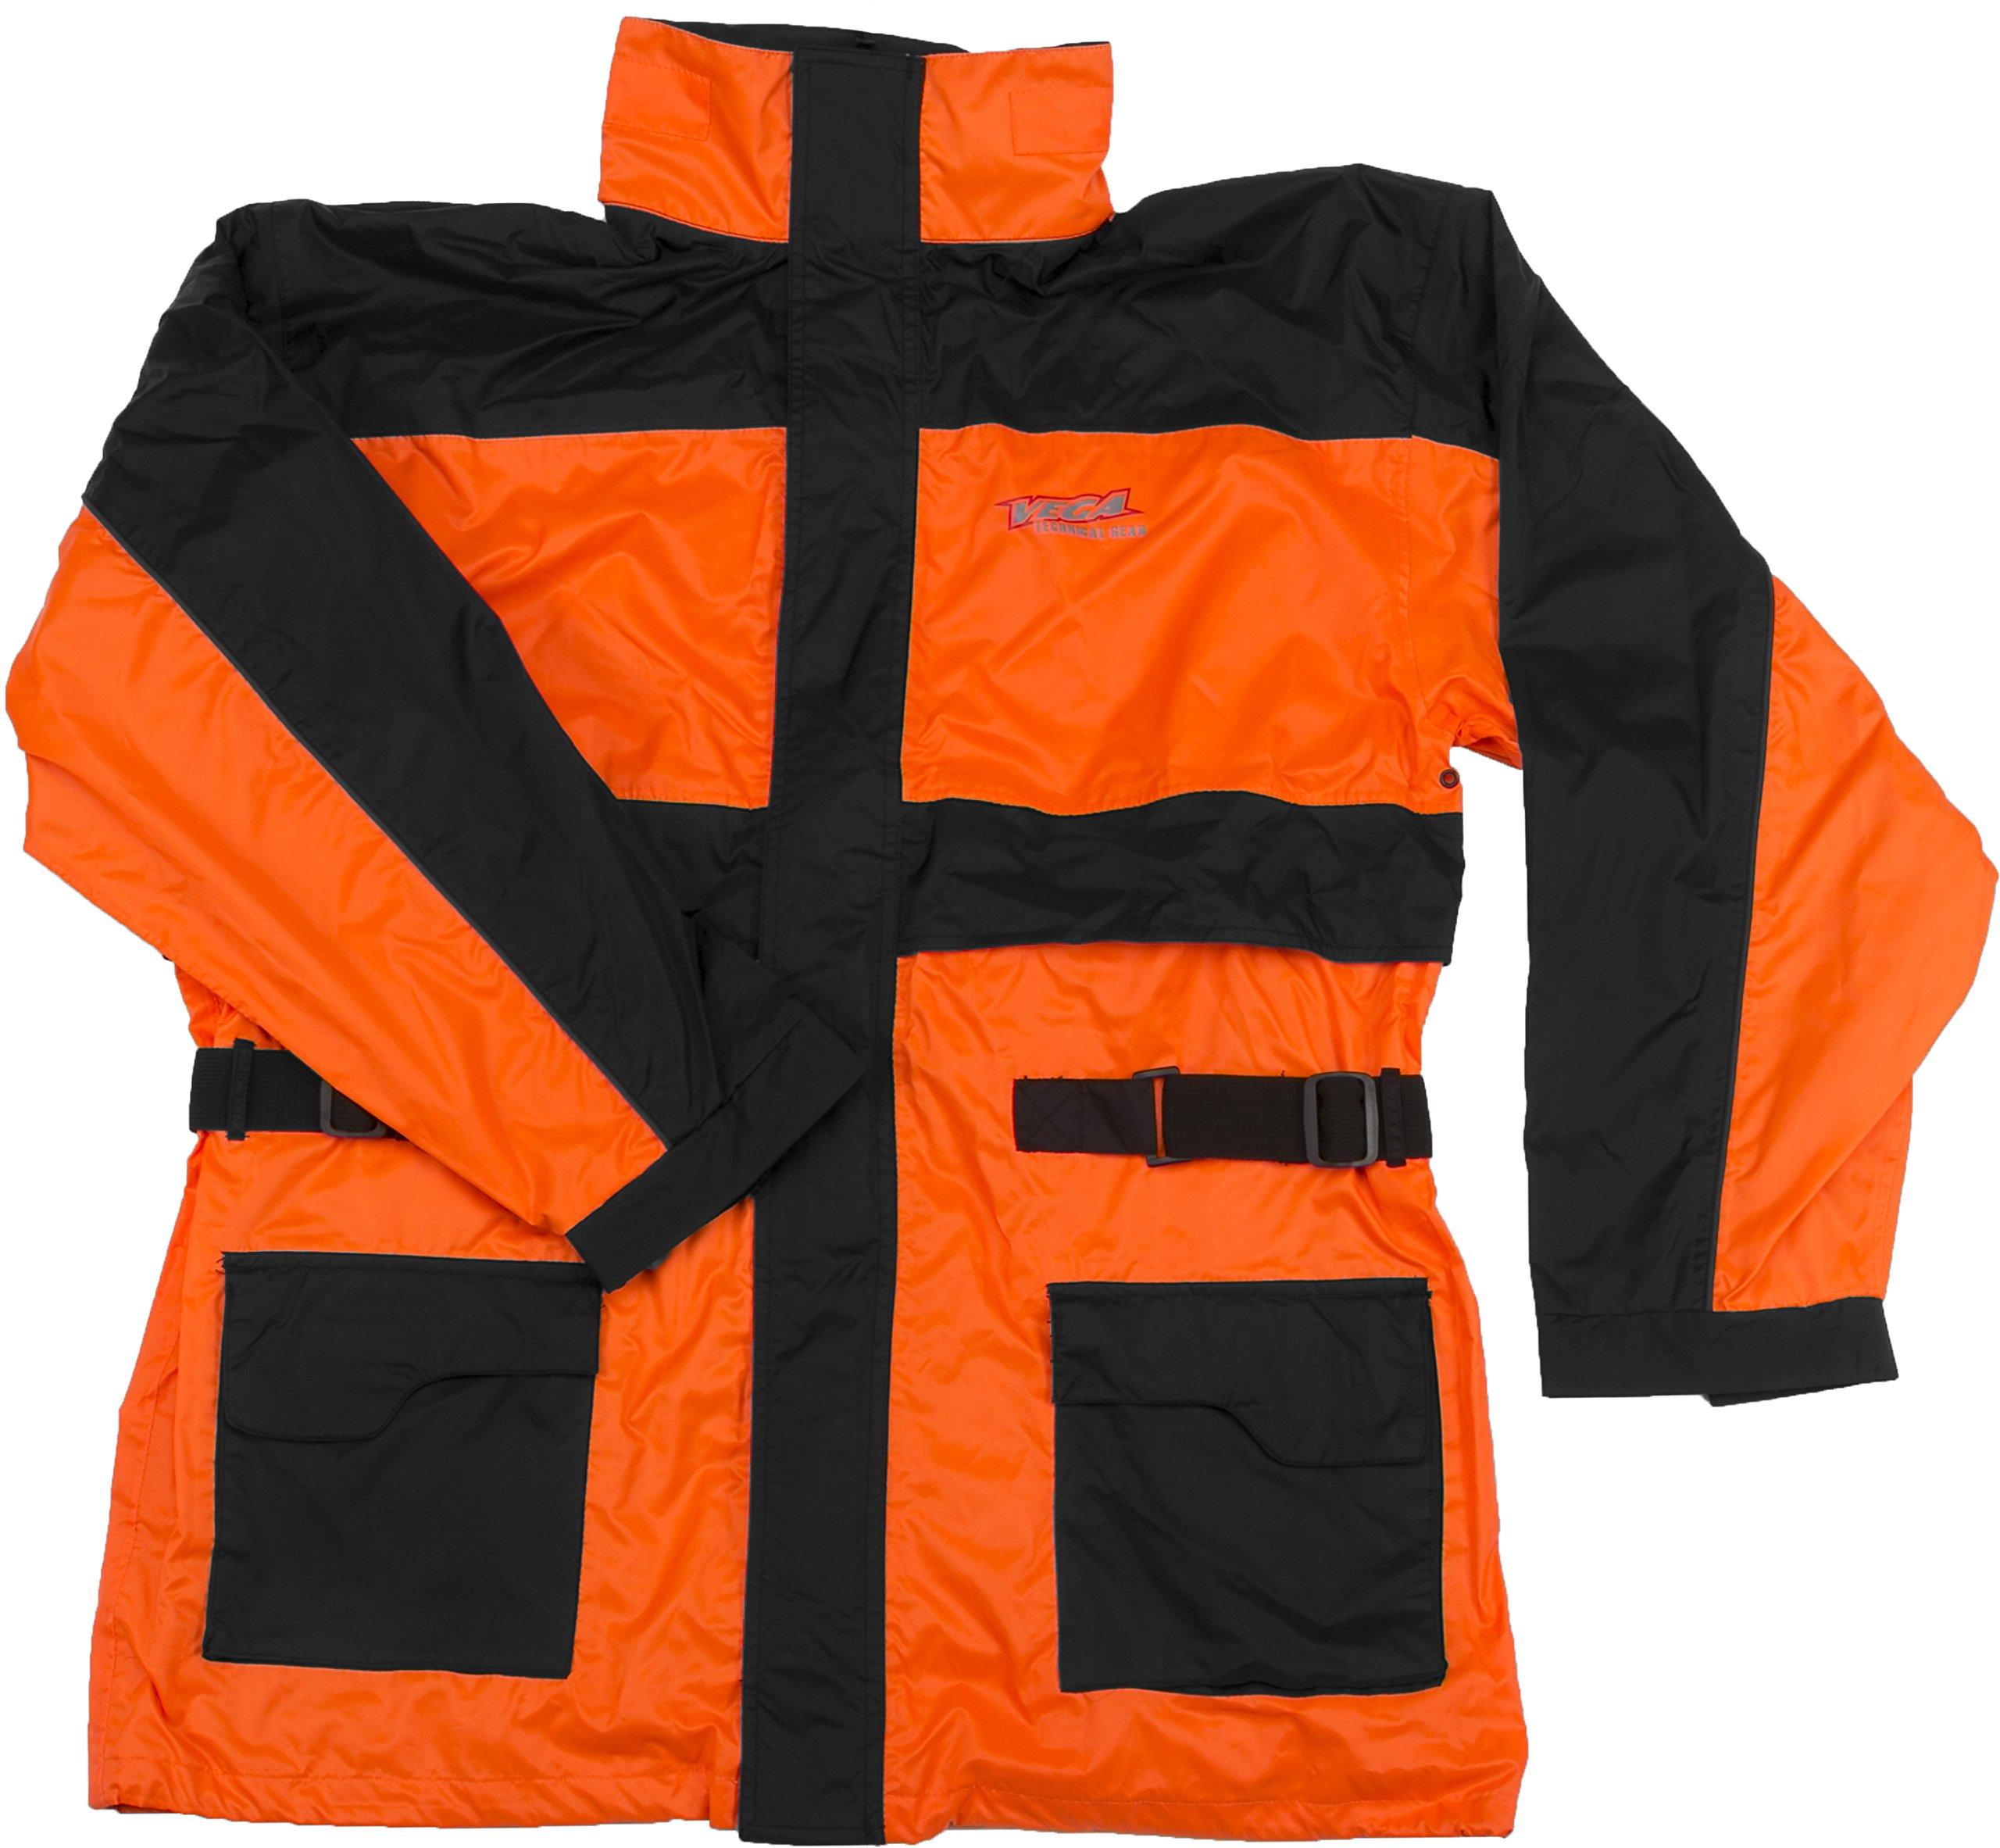 Vega Technical Gear Rain Jacket (Optic Orange, X-Large)